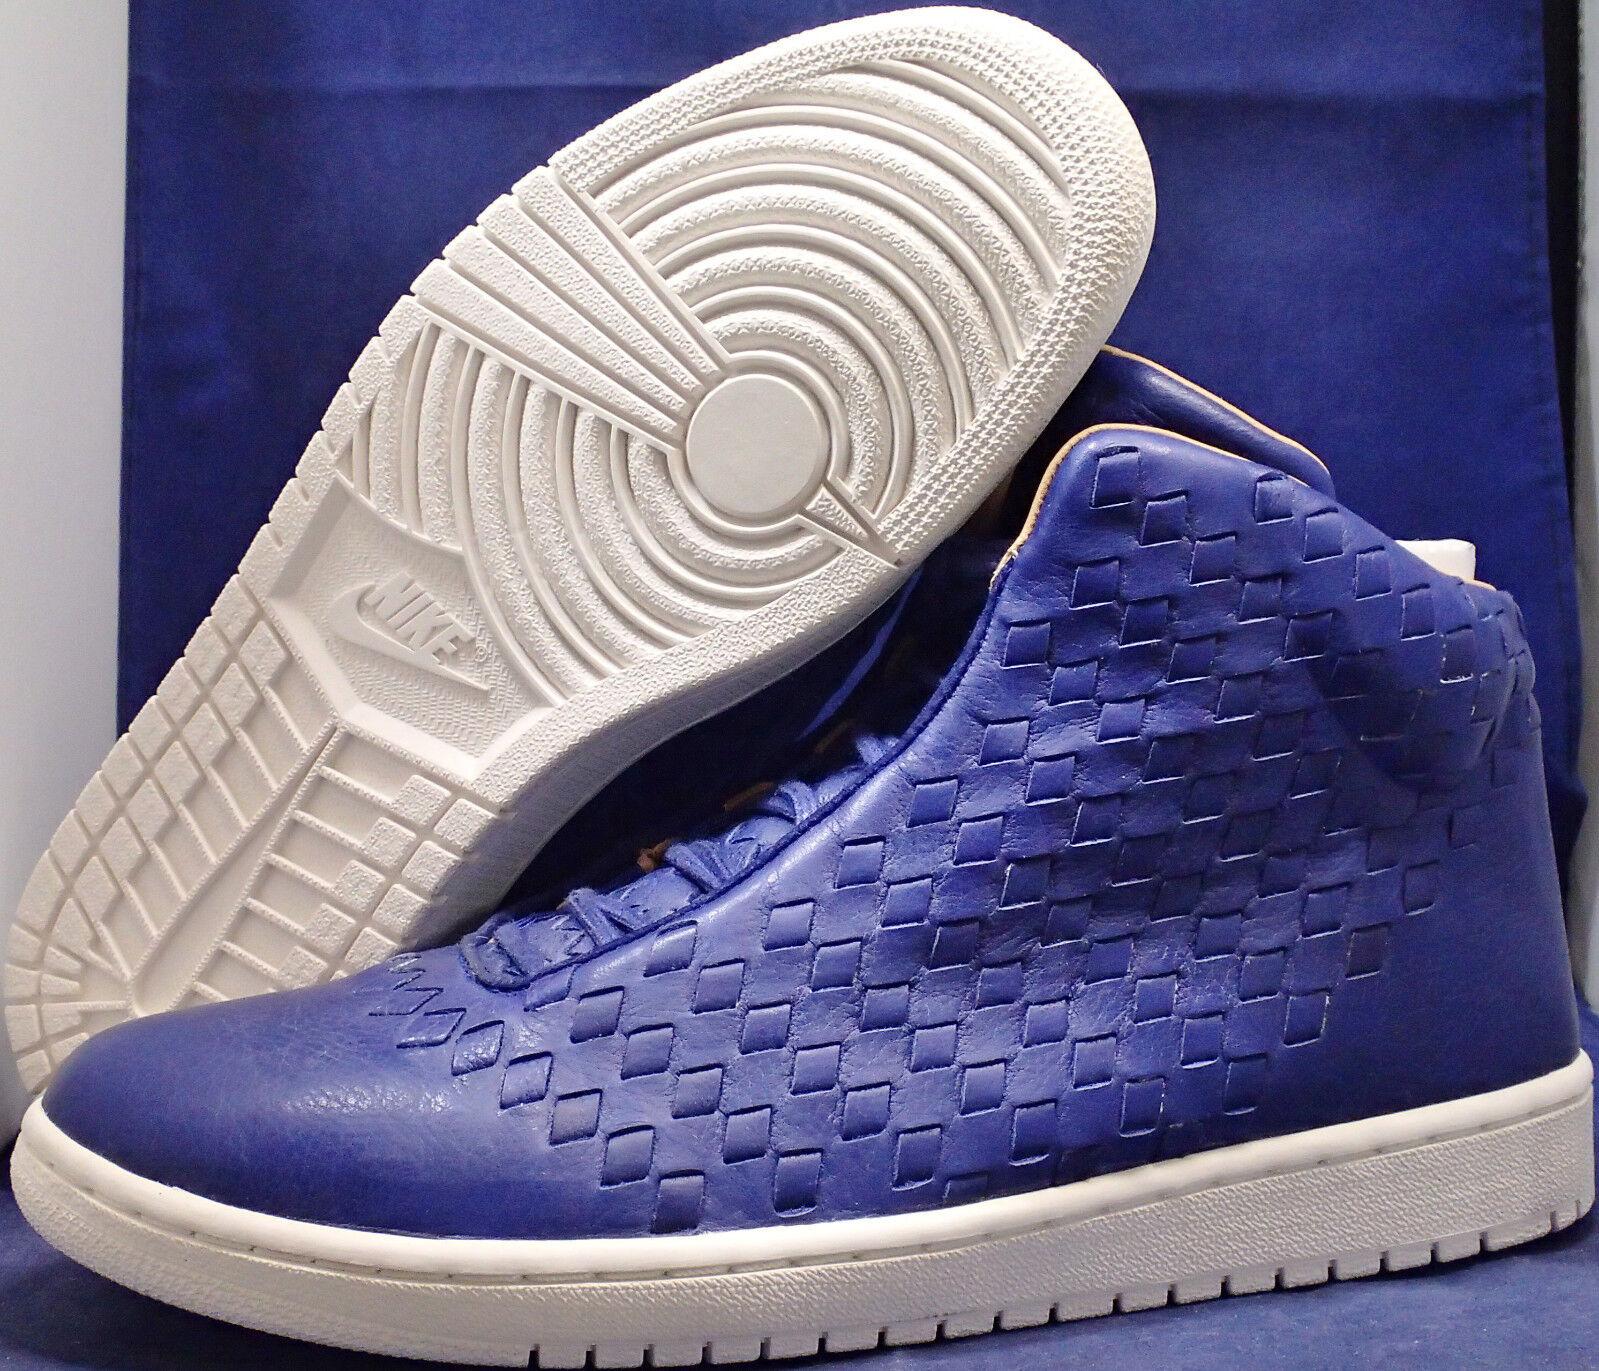 2015 Nike Air Jordan Shine Deep Royal bluee Sail Vachetta Tan SZ 11.5  689480-410